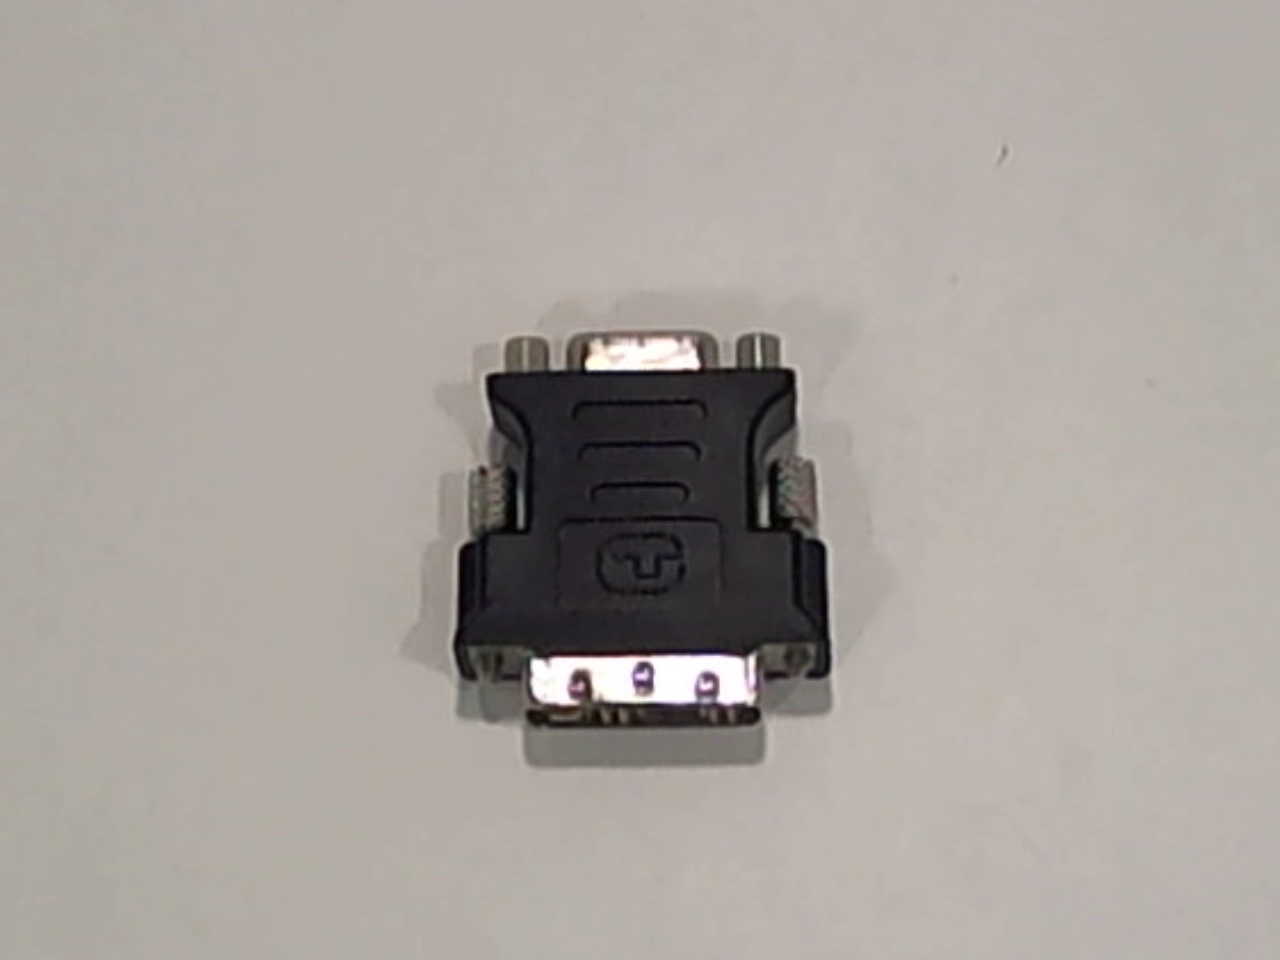 vga buchse auf dvi stecker adapter adapter. Black Bedroom Furniture Sets. Home Design Ideas